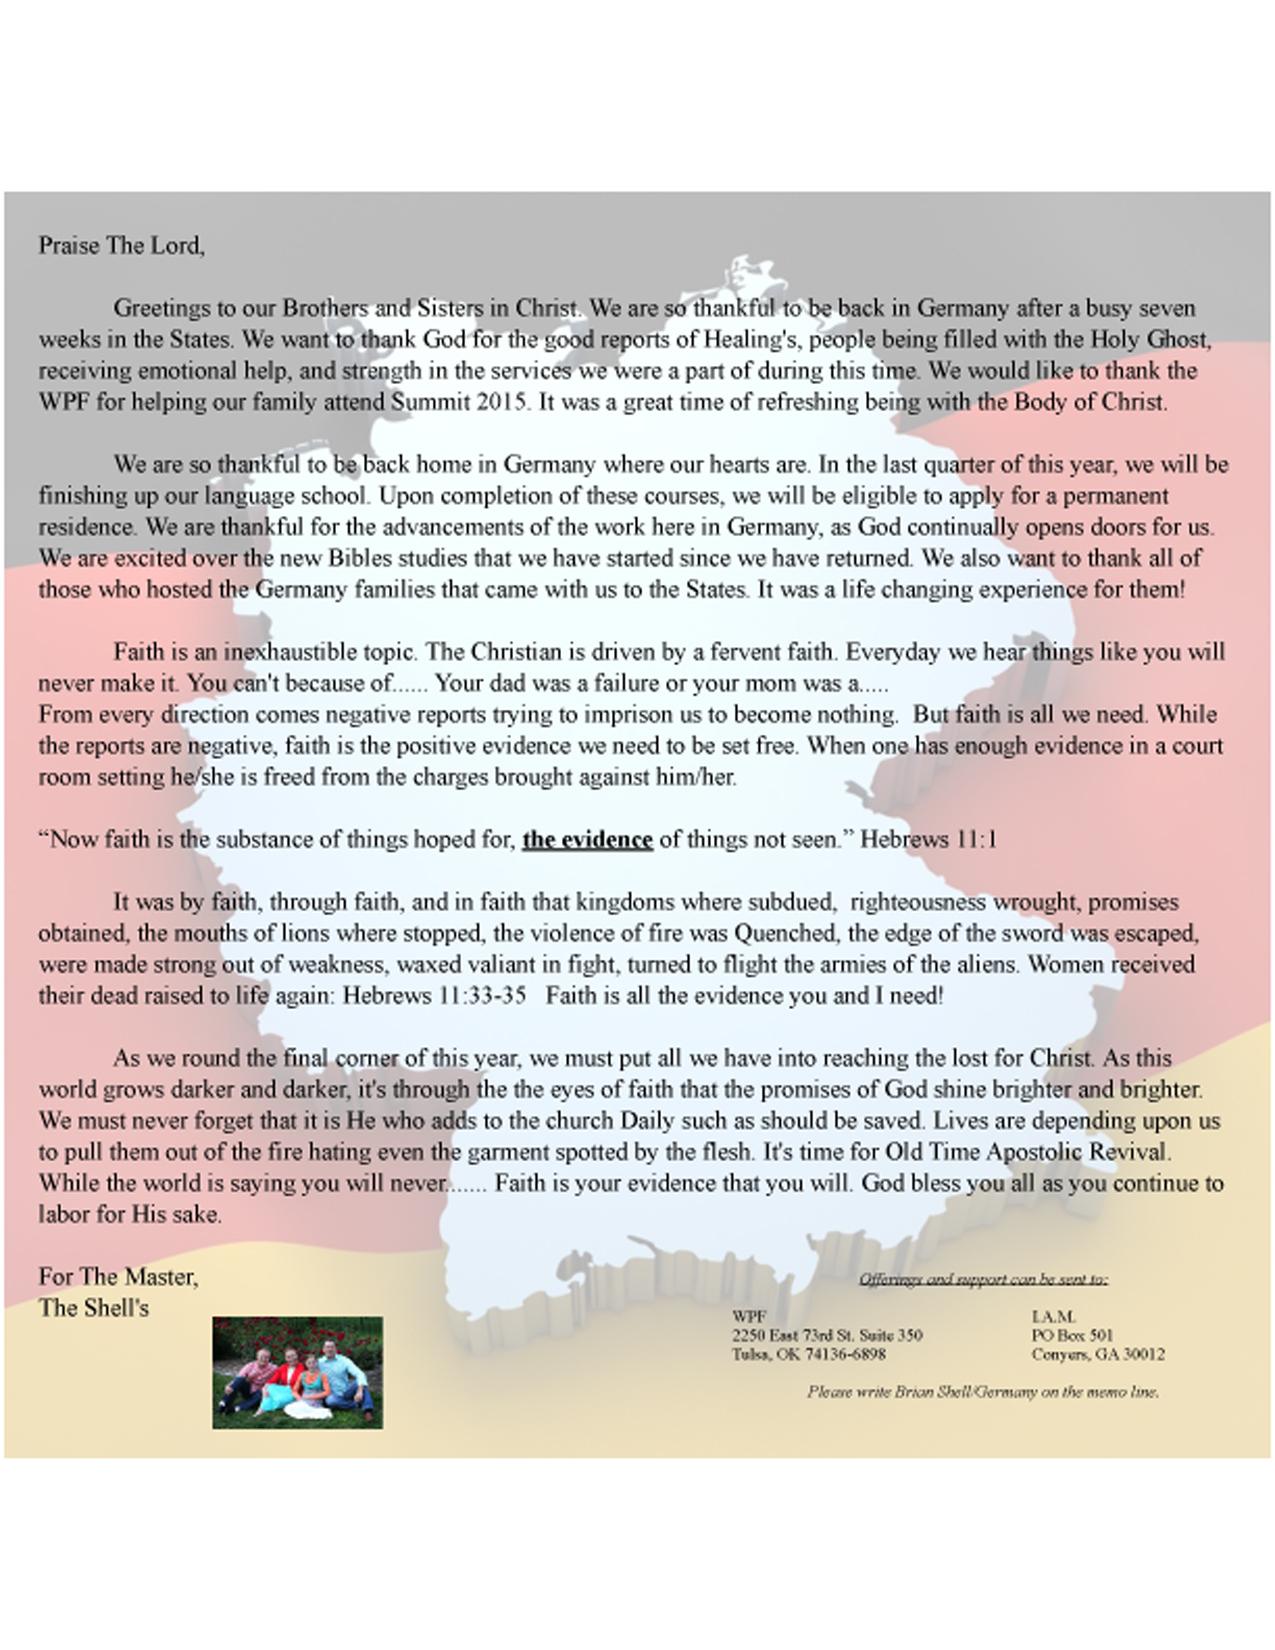 Germany – Missionary Brian Shell